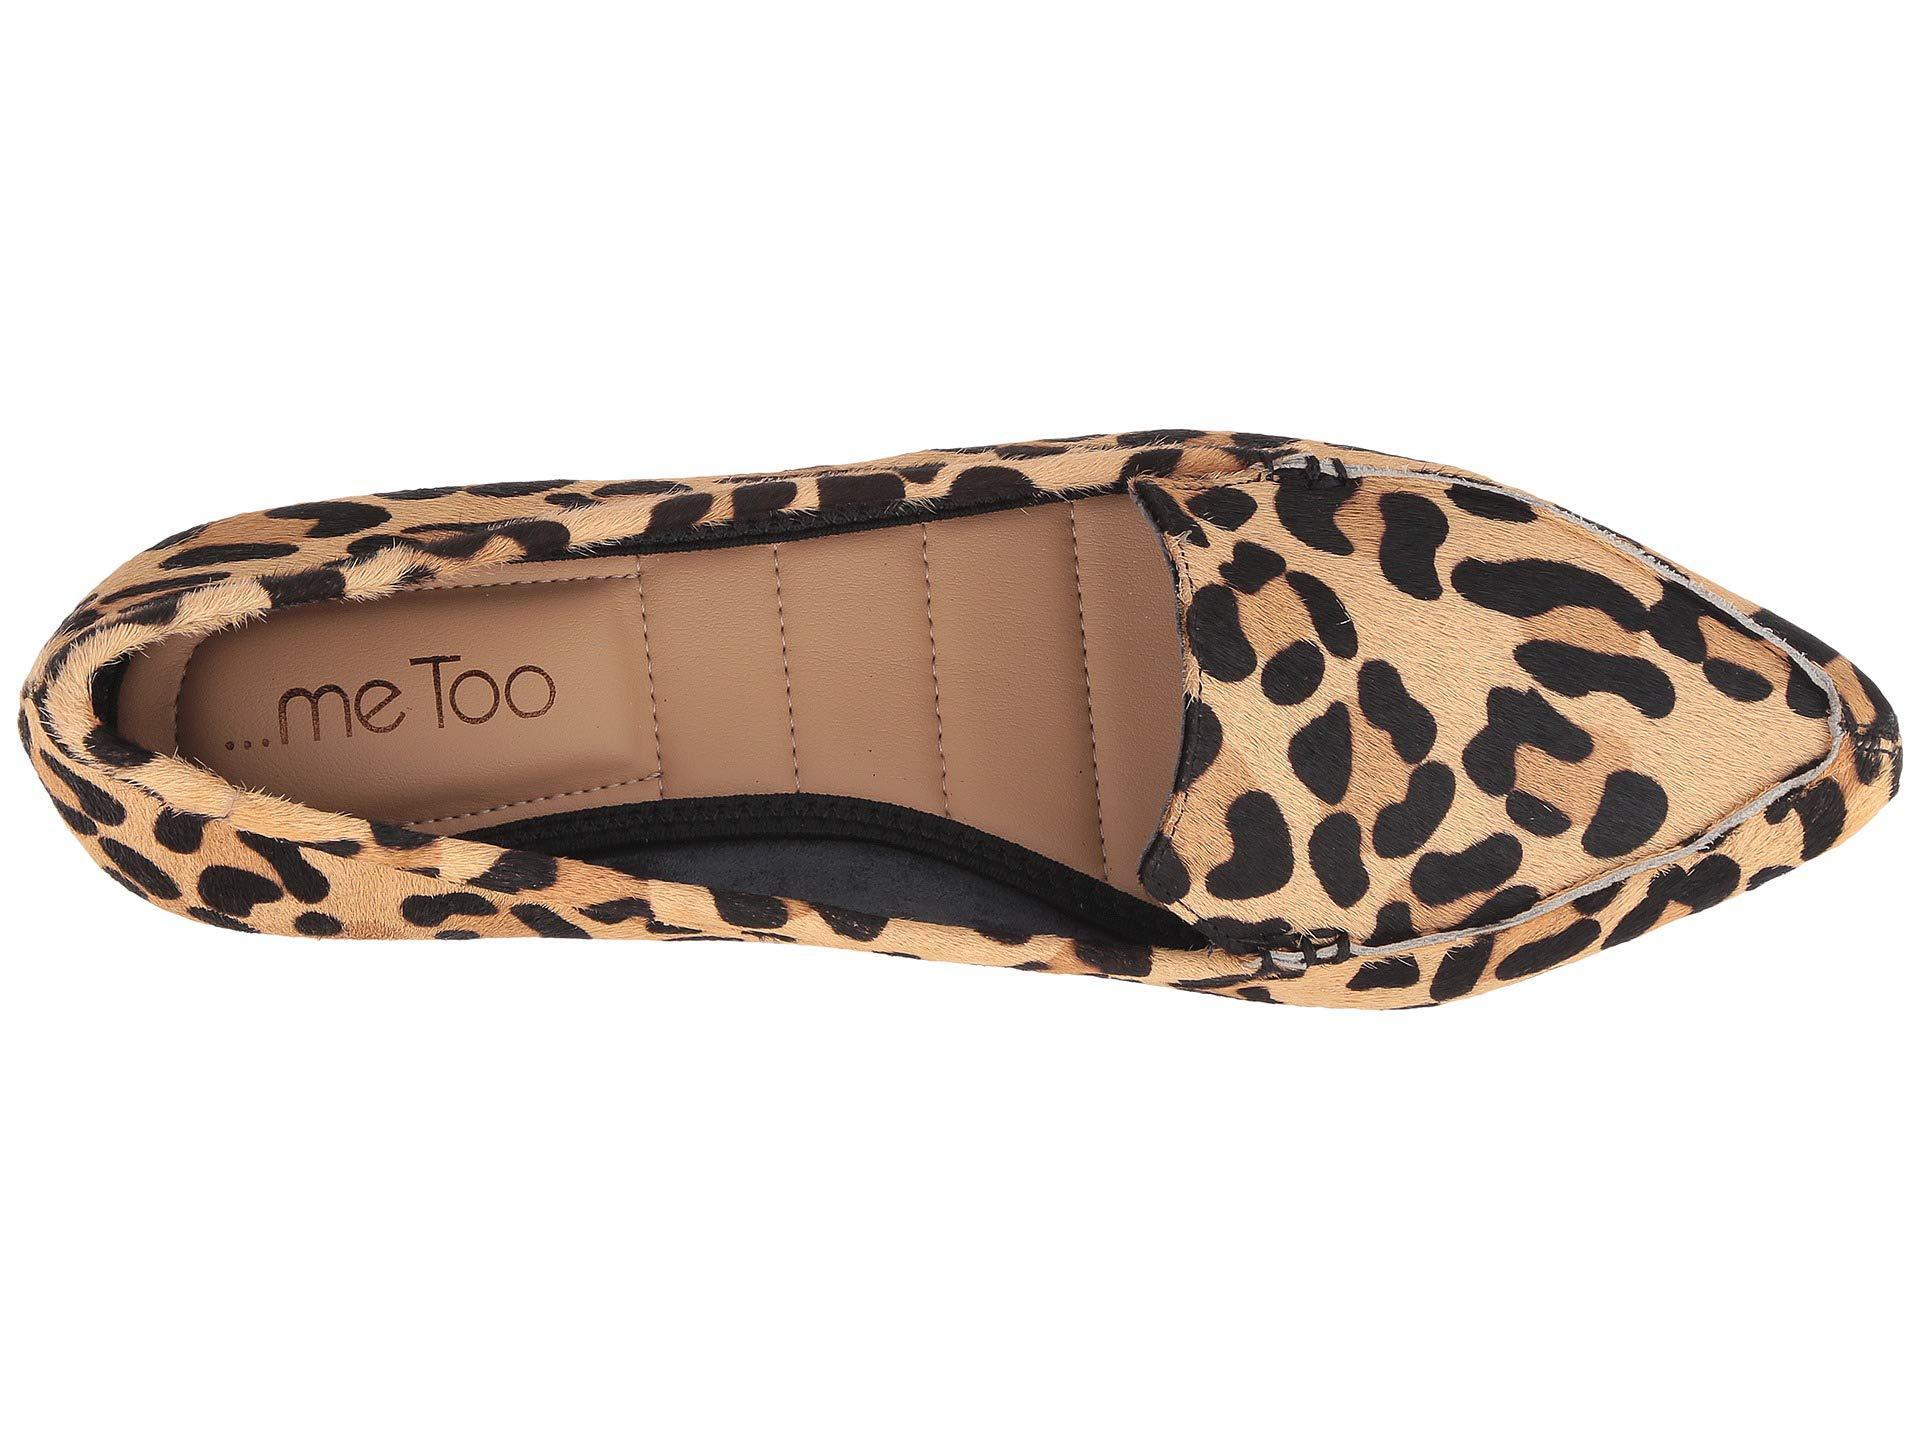 6126ba3aa2a Me Too - Audra (black Sheep Nappa) Women s Shoes - Lyst. View fullscreen